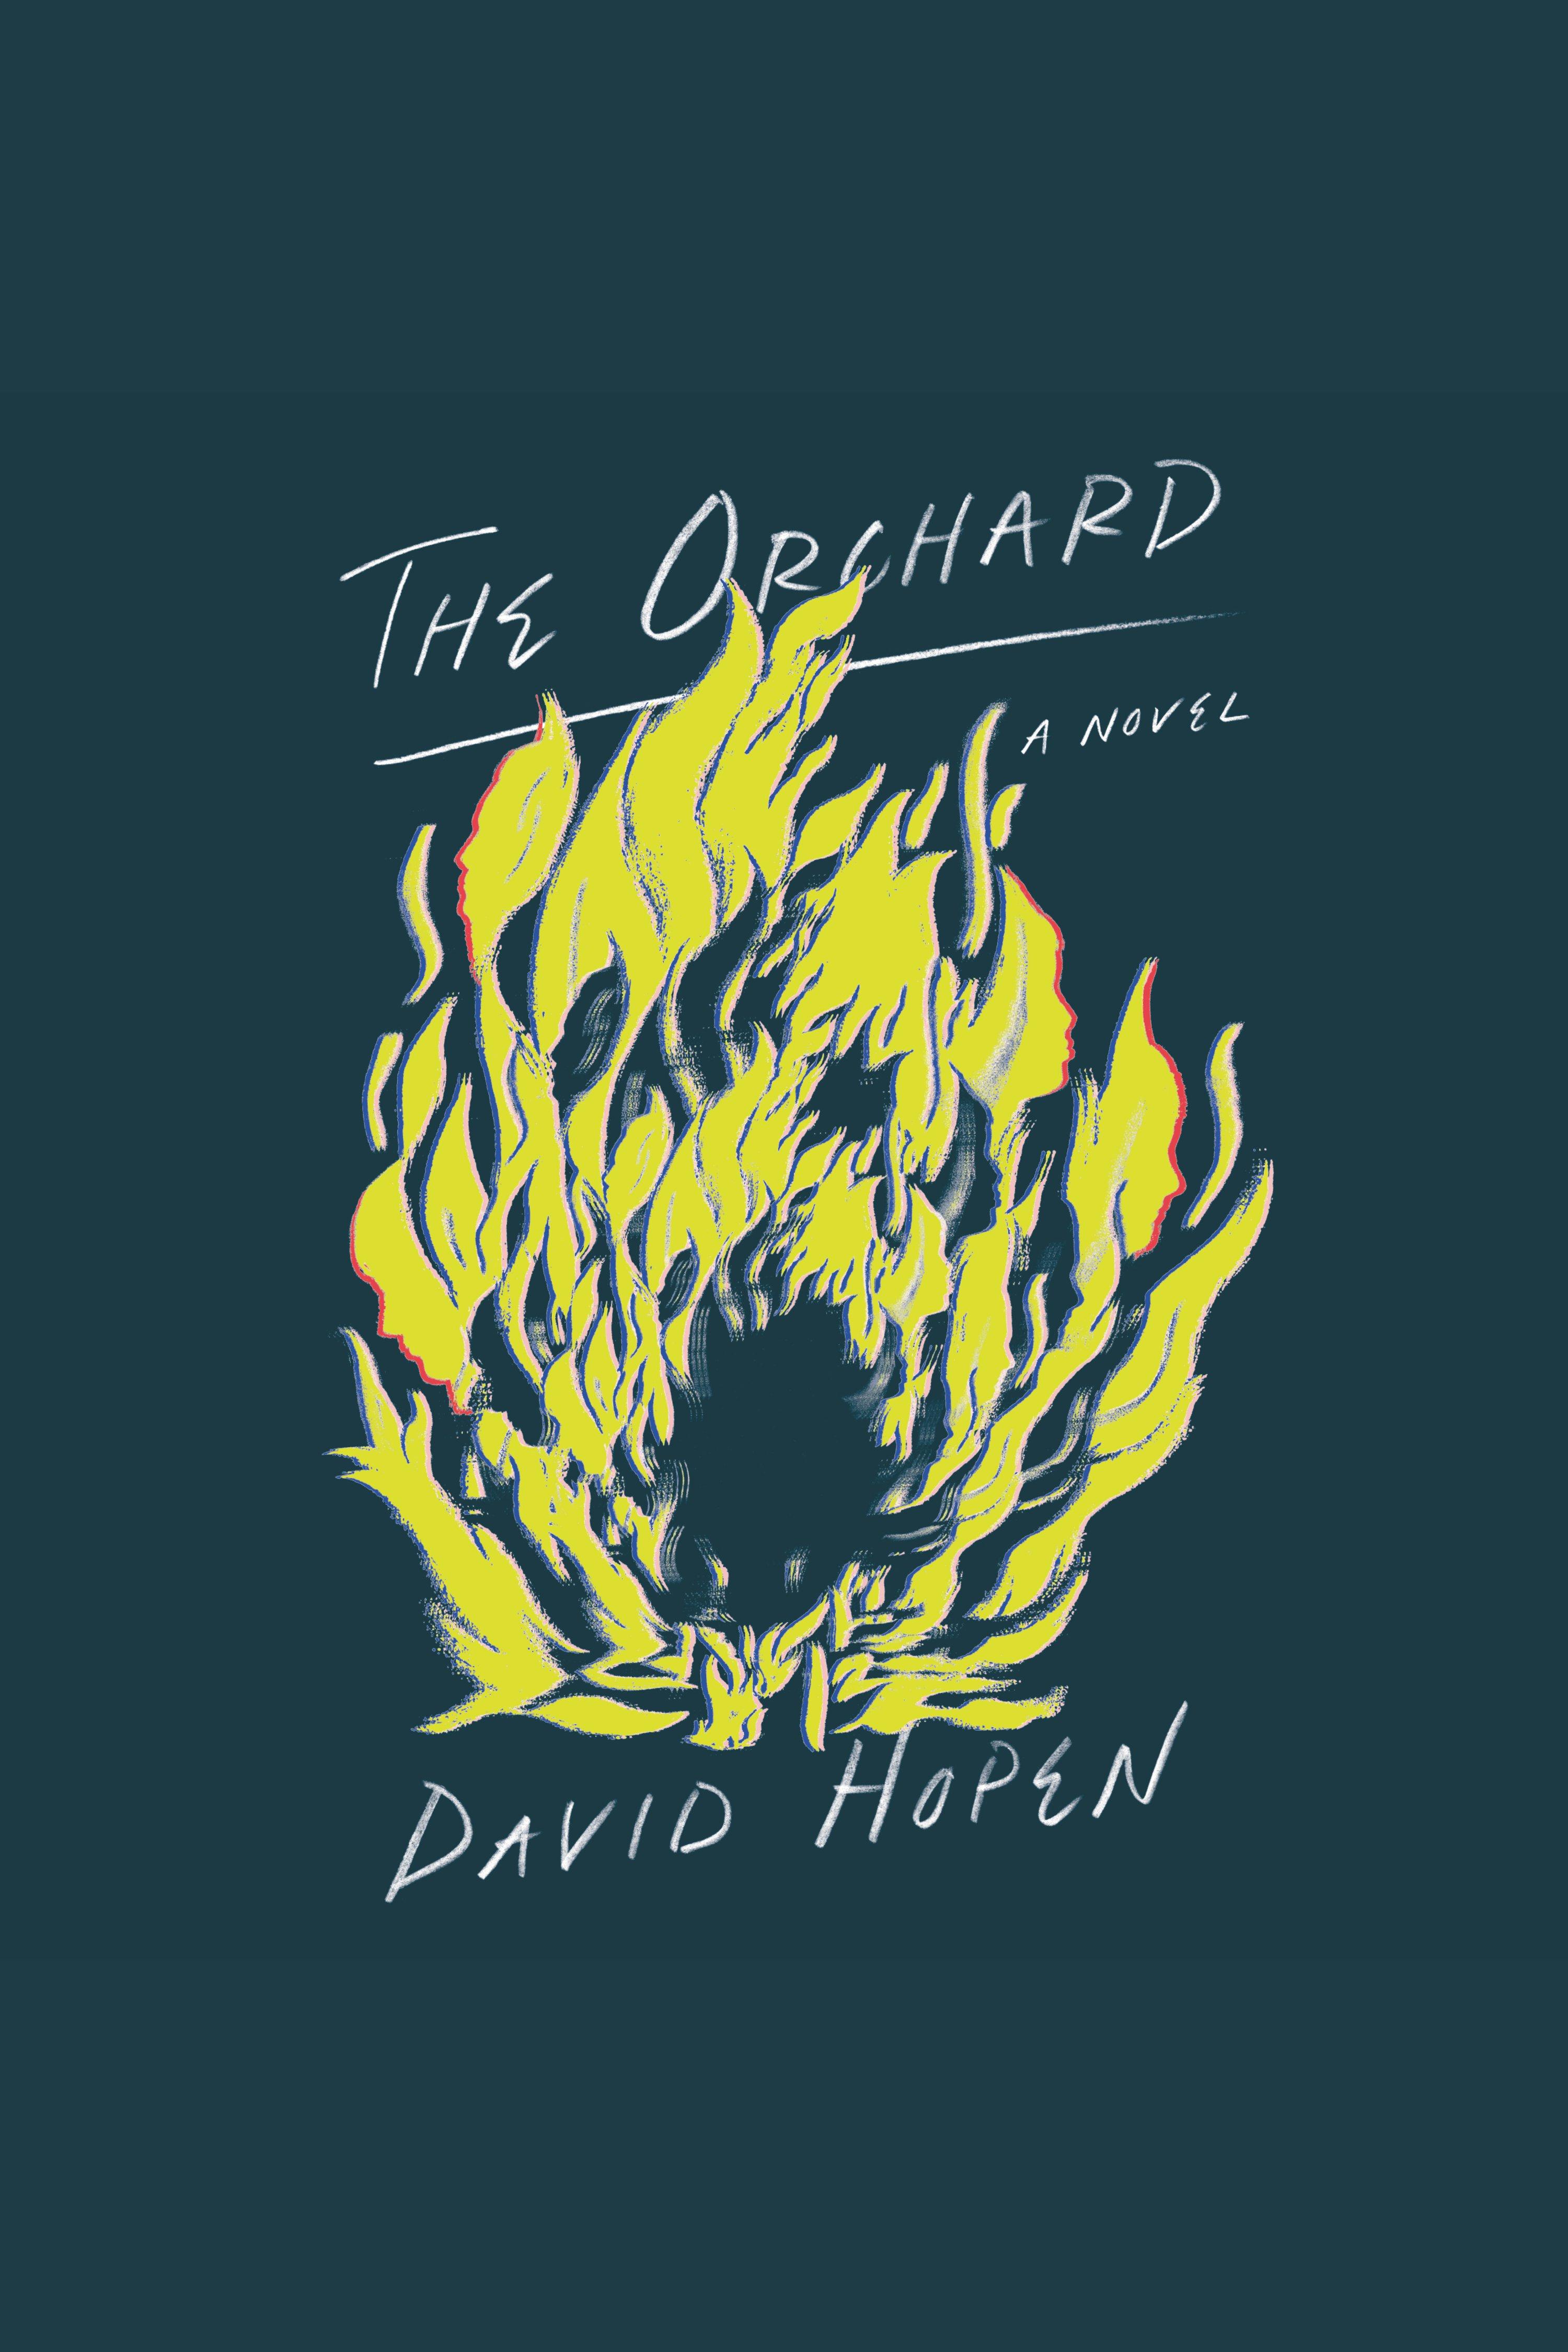 Orchard, The A Novel